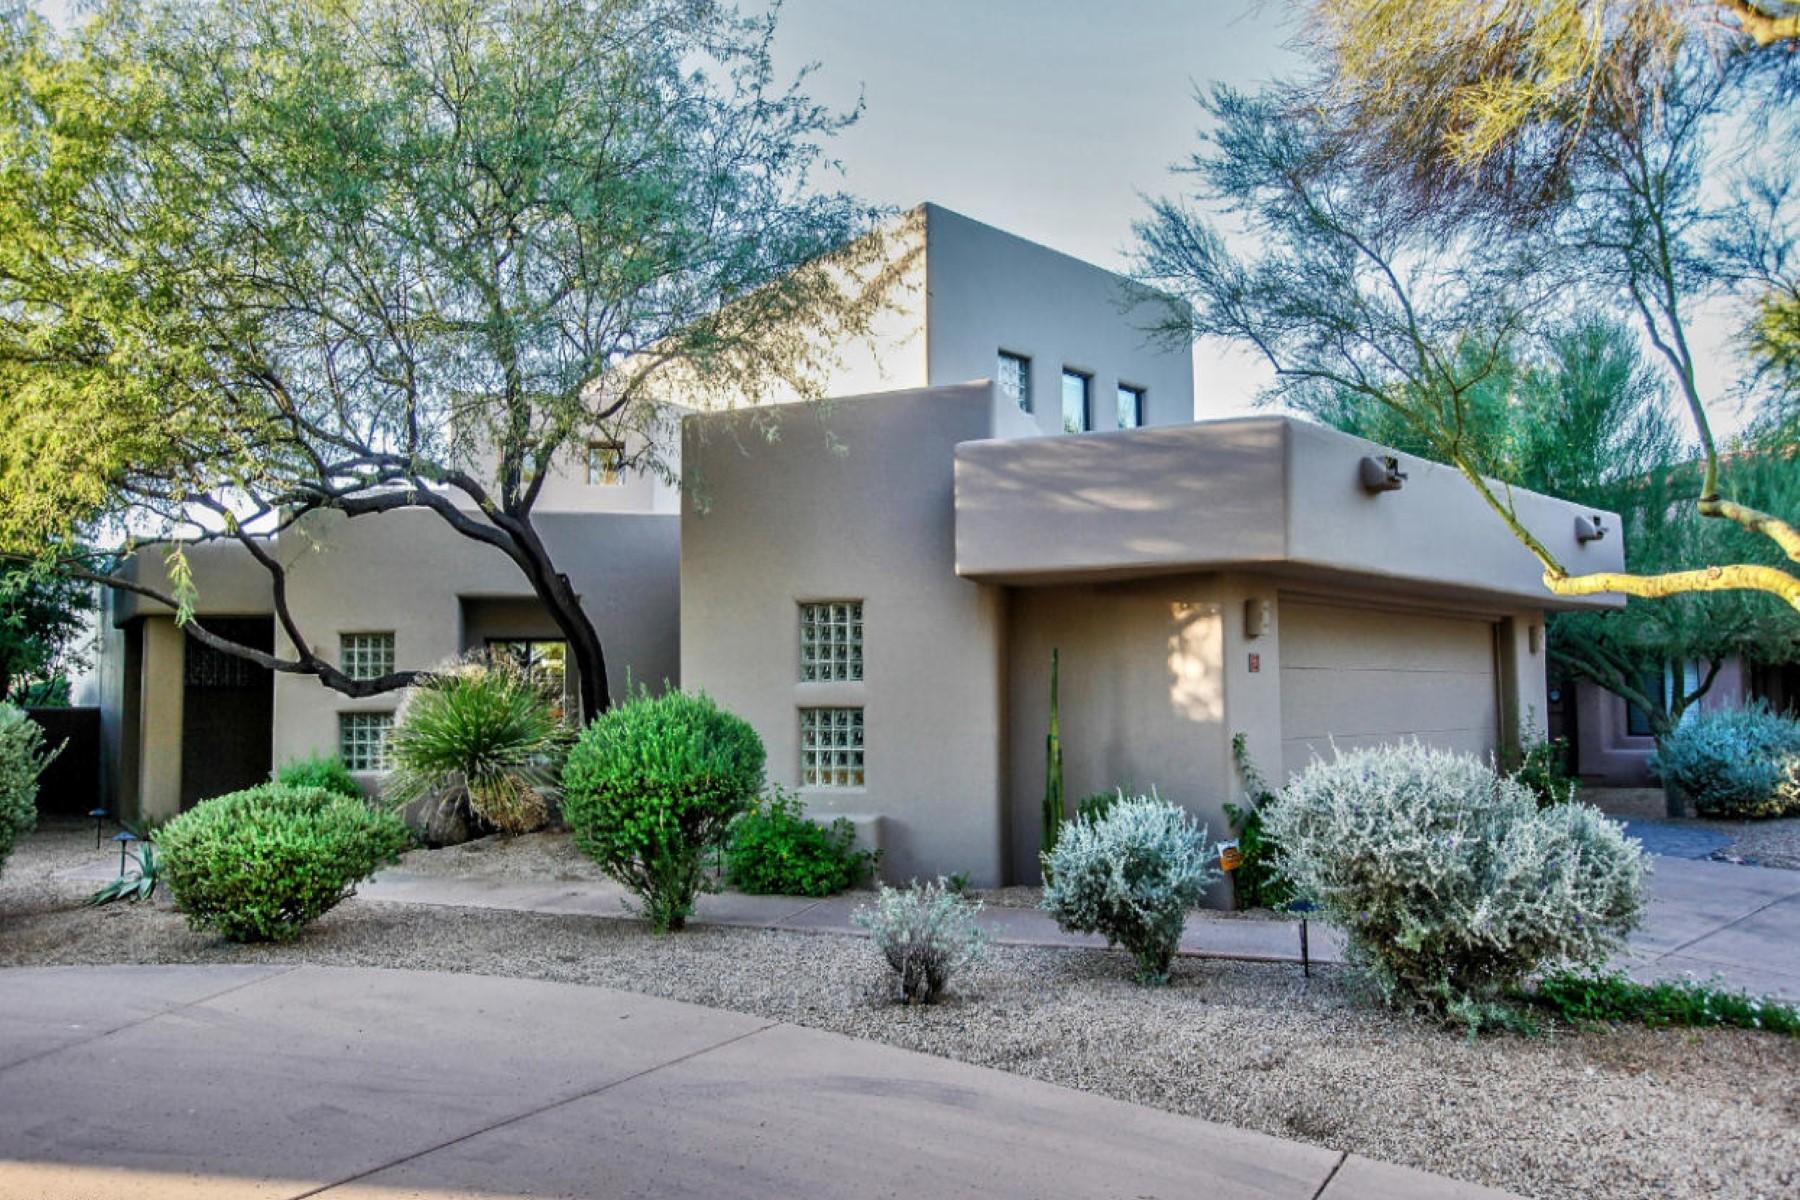 Moradia para Venda às Absolutely gorgeous, furnished contemporary home on the golf course 7500 E Boulders Pkwy #63 Scottsdale, Arizona 85266 Estados Unidos